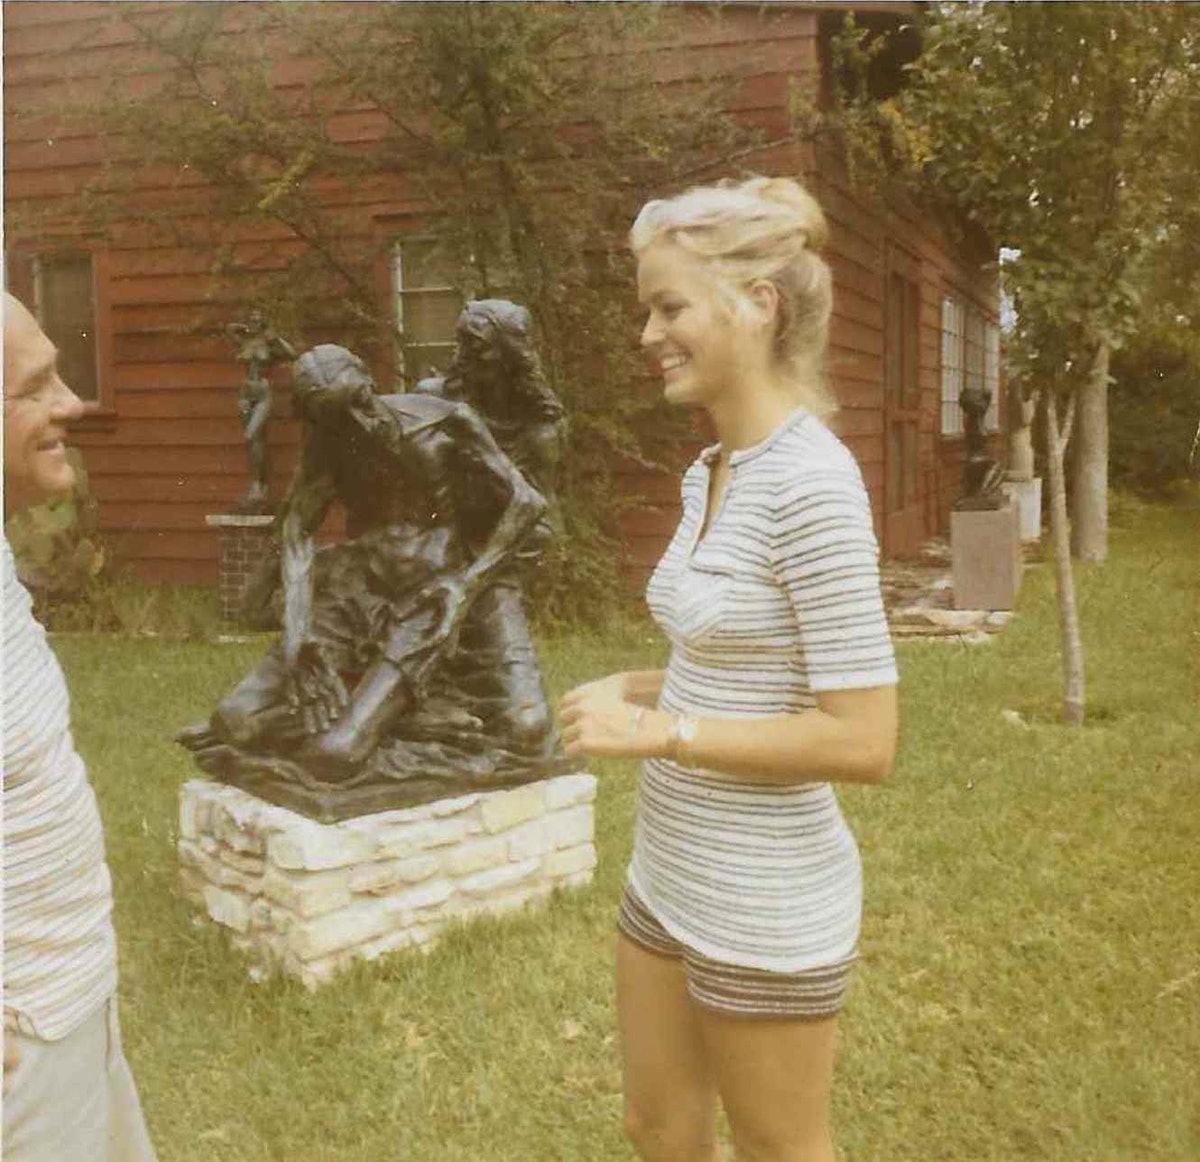 Charles Umlauf Pieta Farrah Fawcett Sept 1971 Austin Photo Courtesy Greg Walls.jpeg